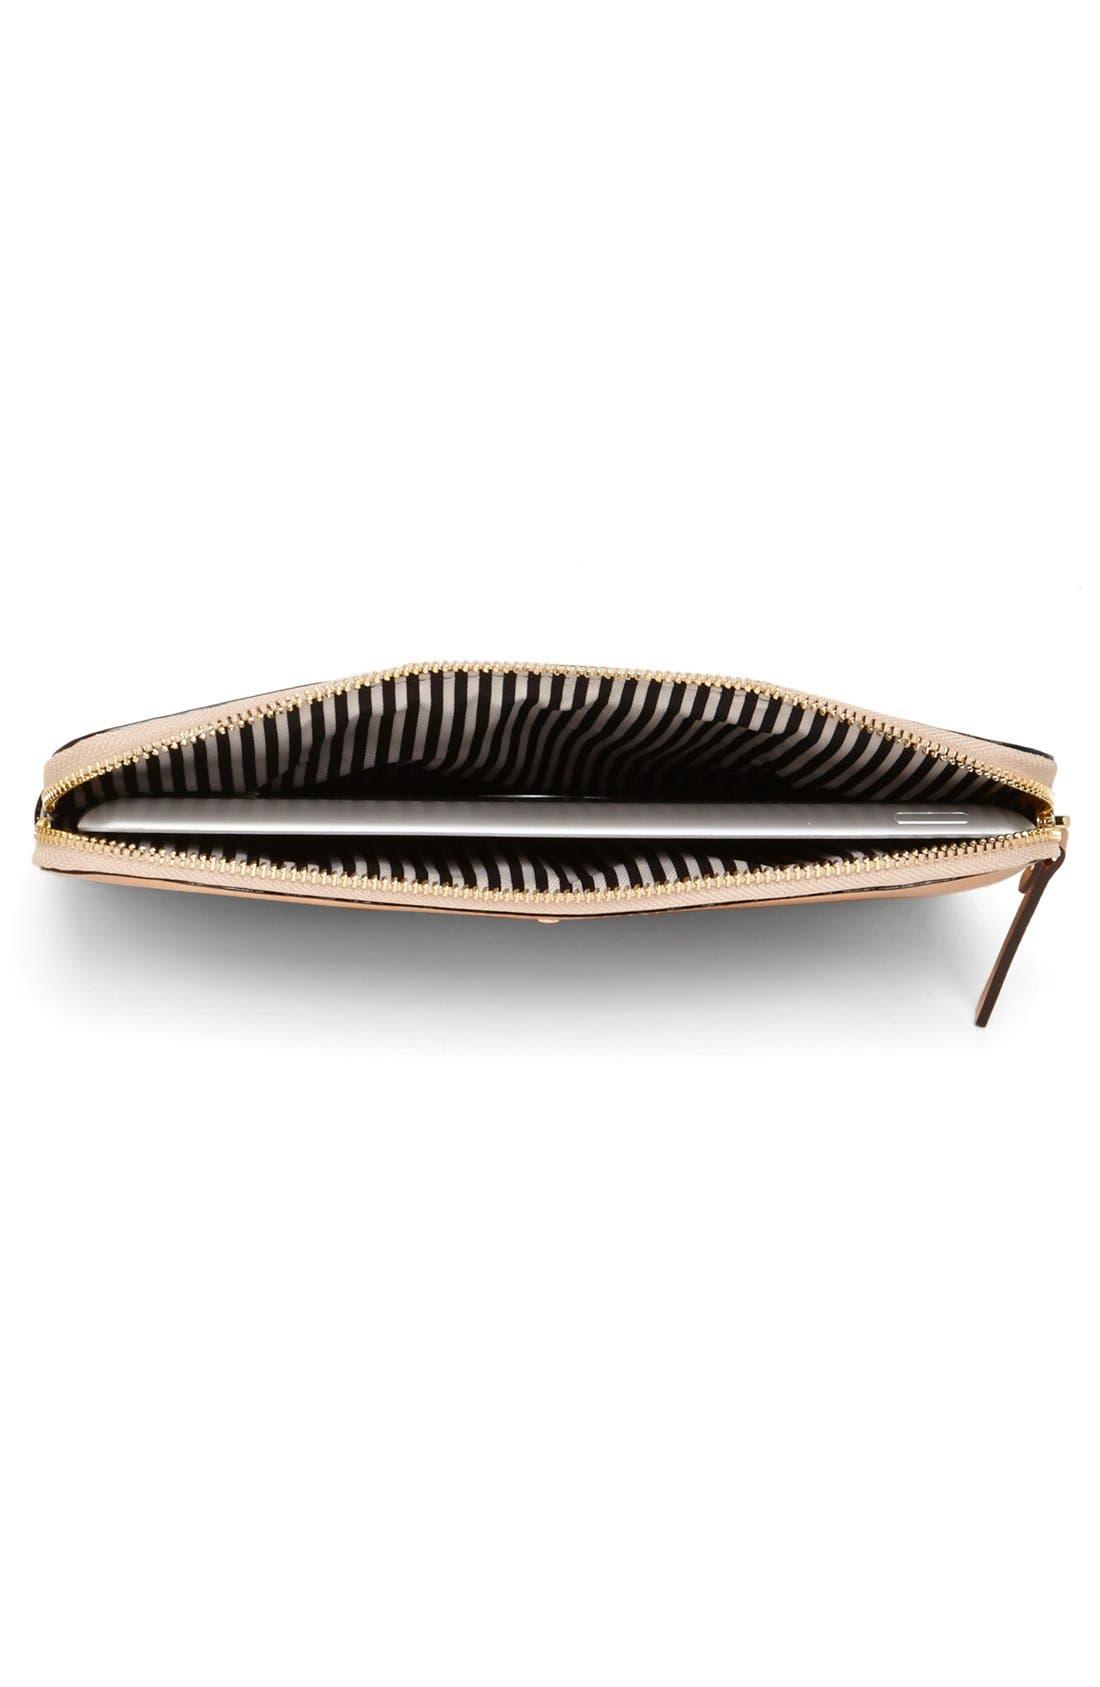 Alternate Image 3  - kate spade new york 'be dazzling' iPad sleeve